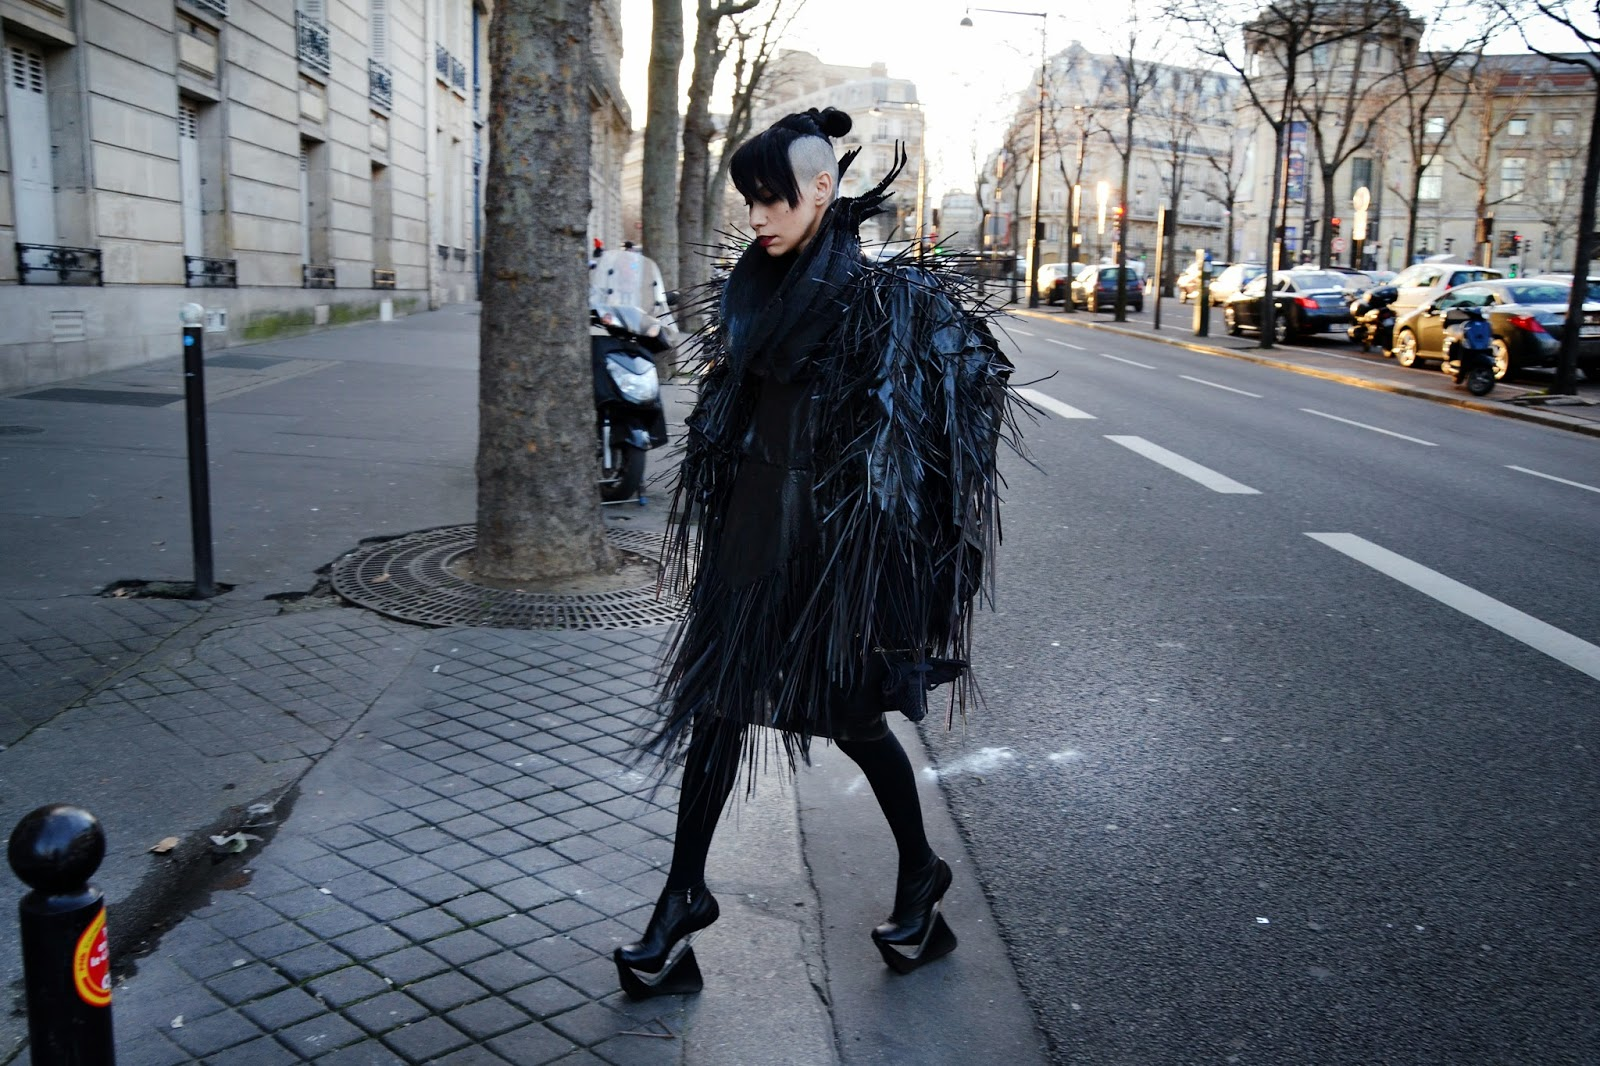 jorge-ayala-createur-fashion-lily-gatins (1).JPG